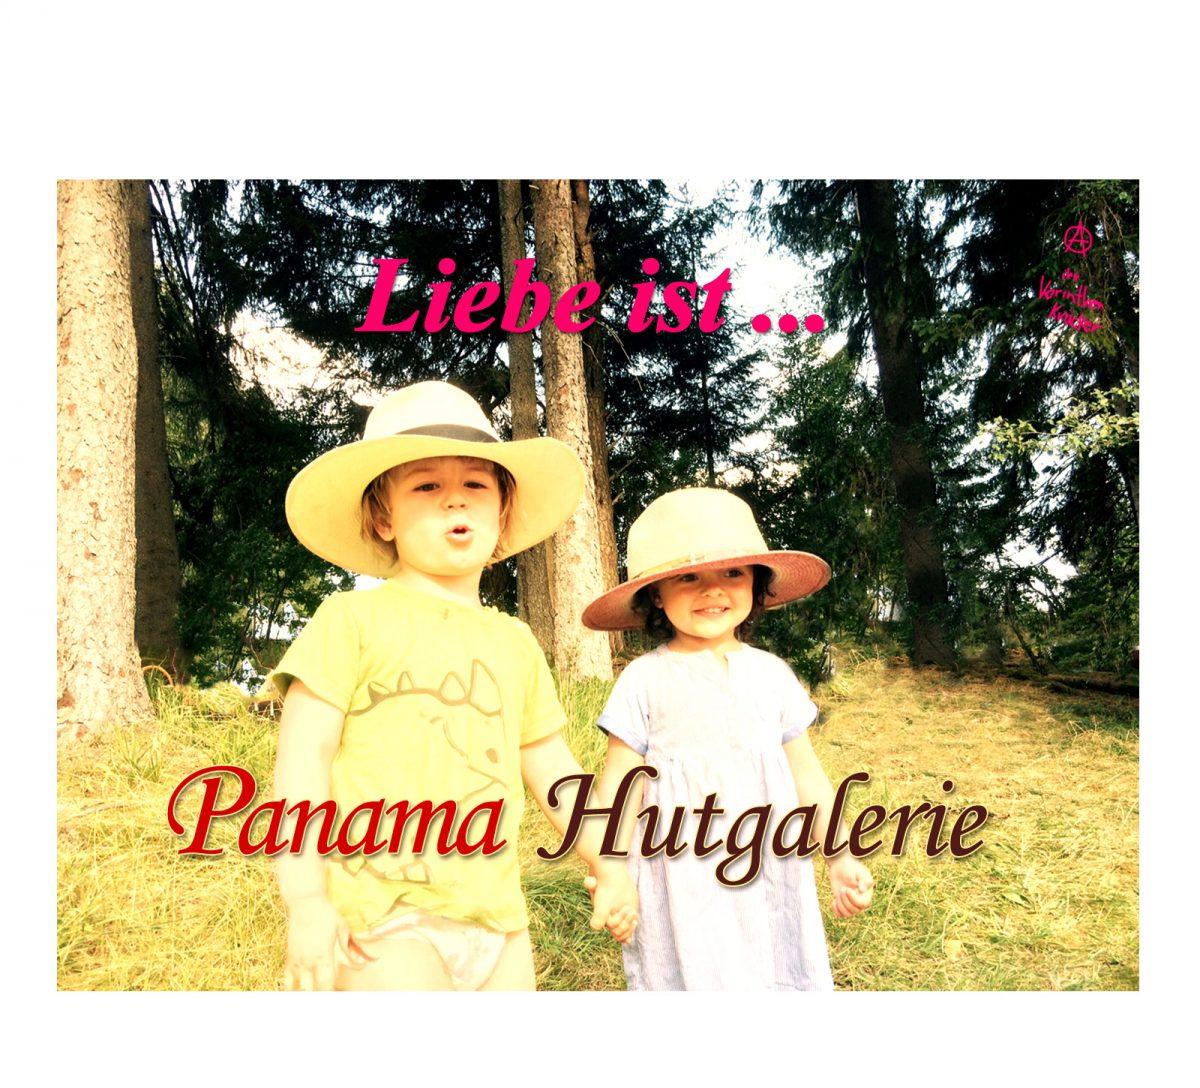 Panama Hutgalerie Postcards